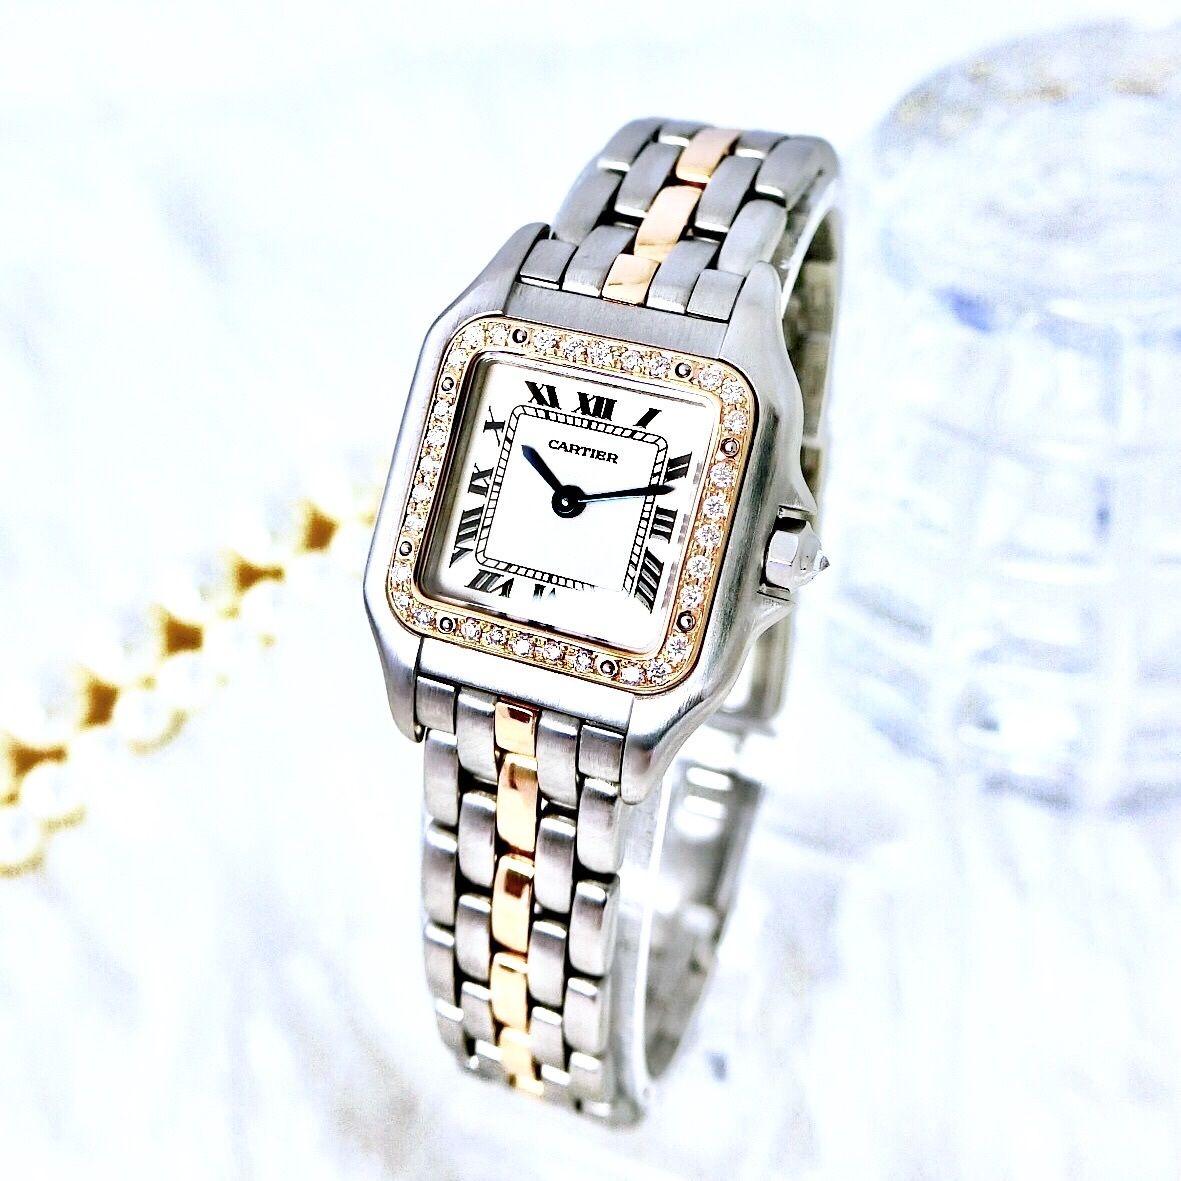 Cartier カルティエ パンテール SM K18コンビ 33P 天然ダイヤモンド クォーツ レディース 腕時計